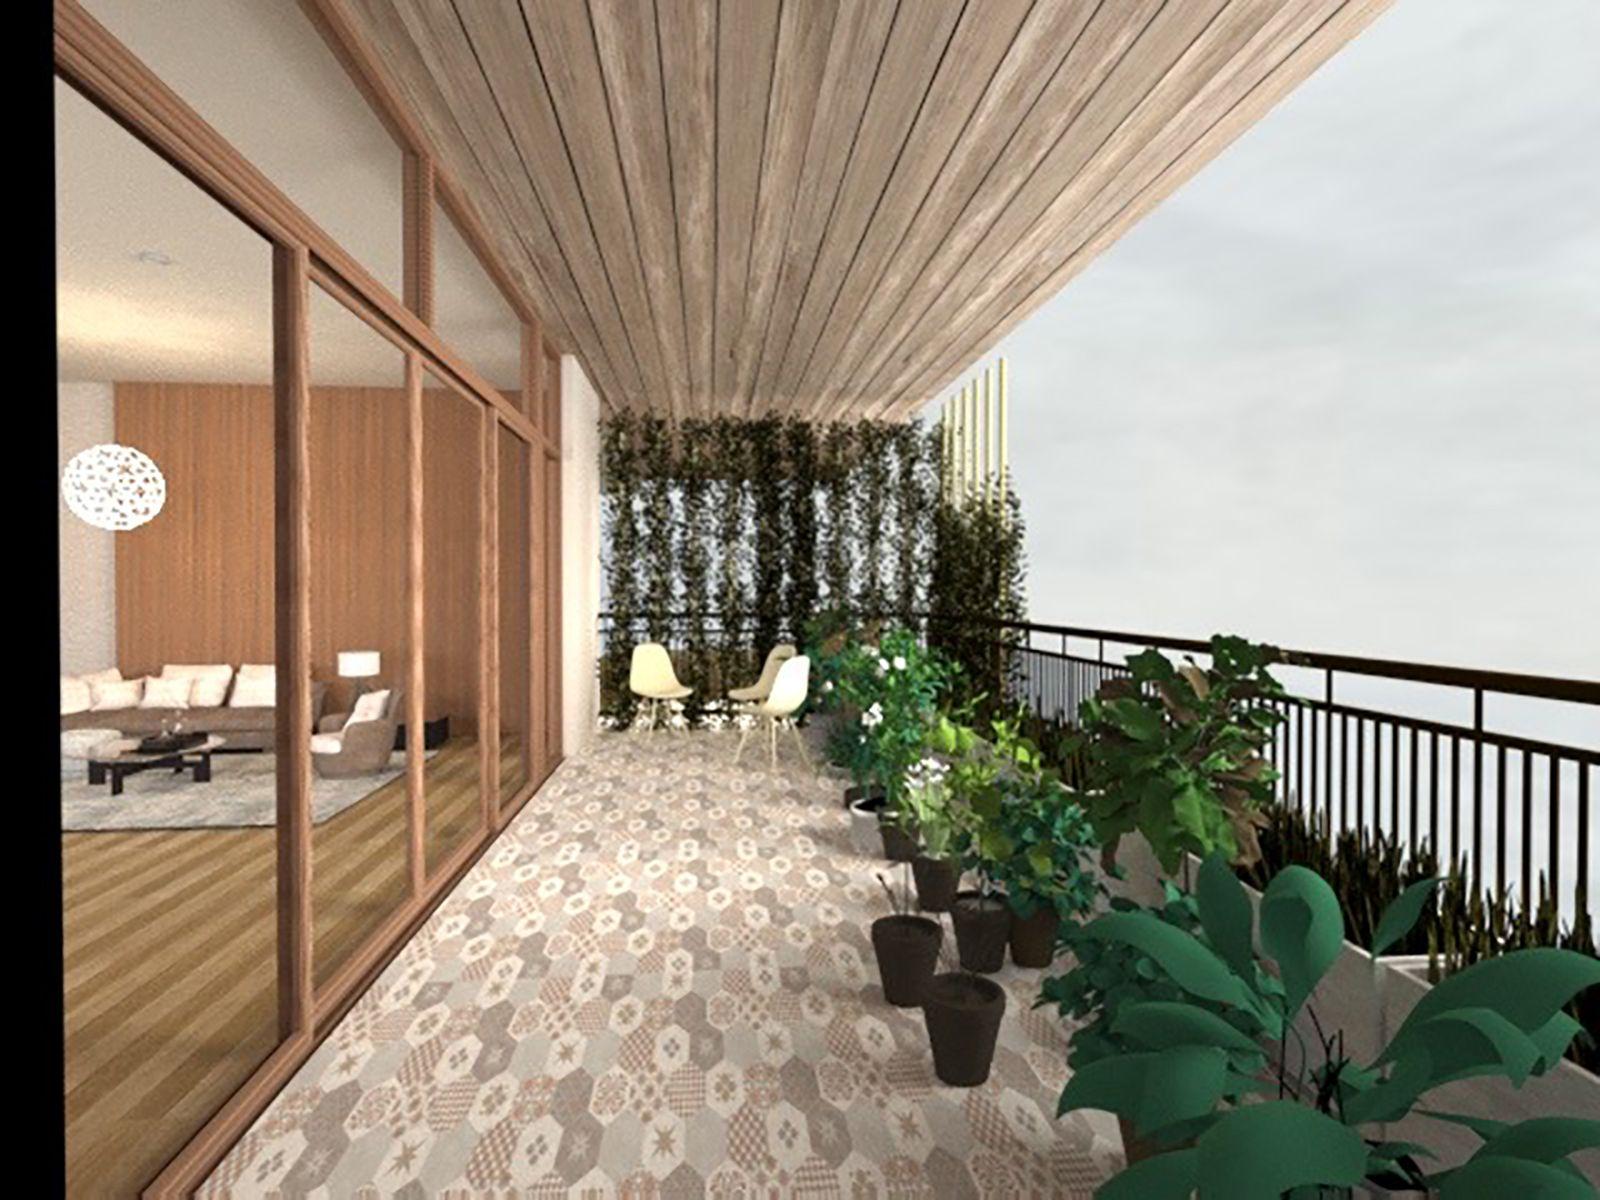 Ecolution - Balcony One